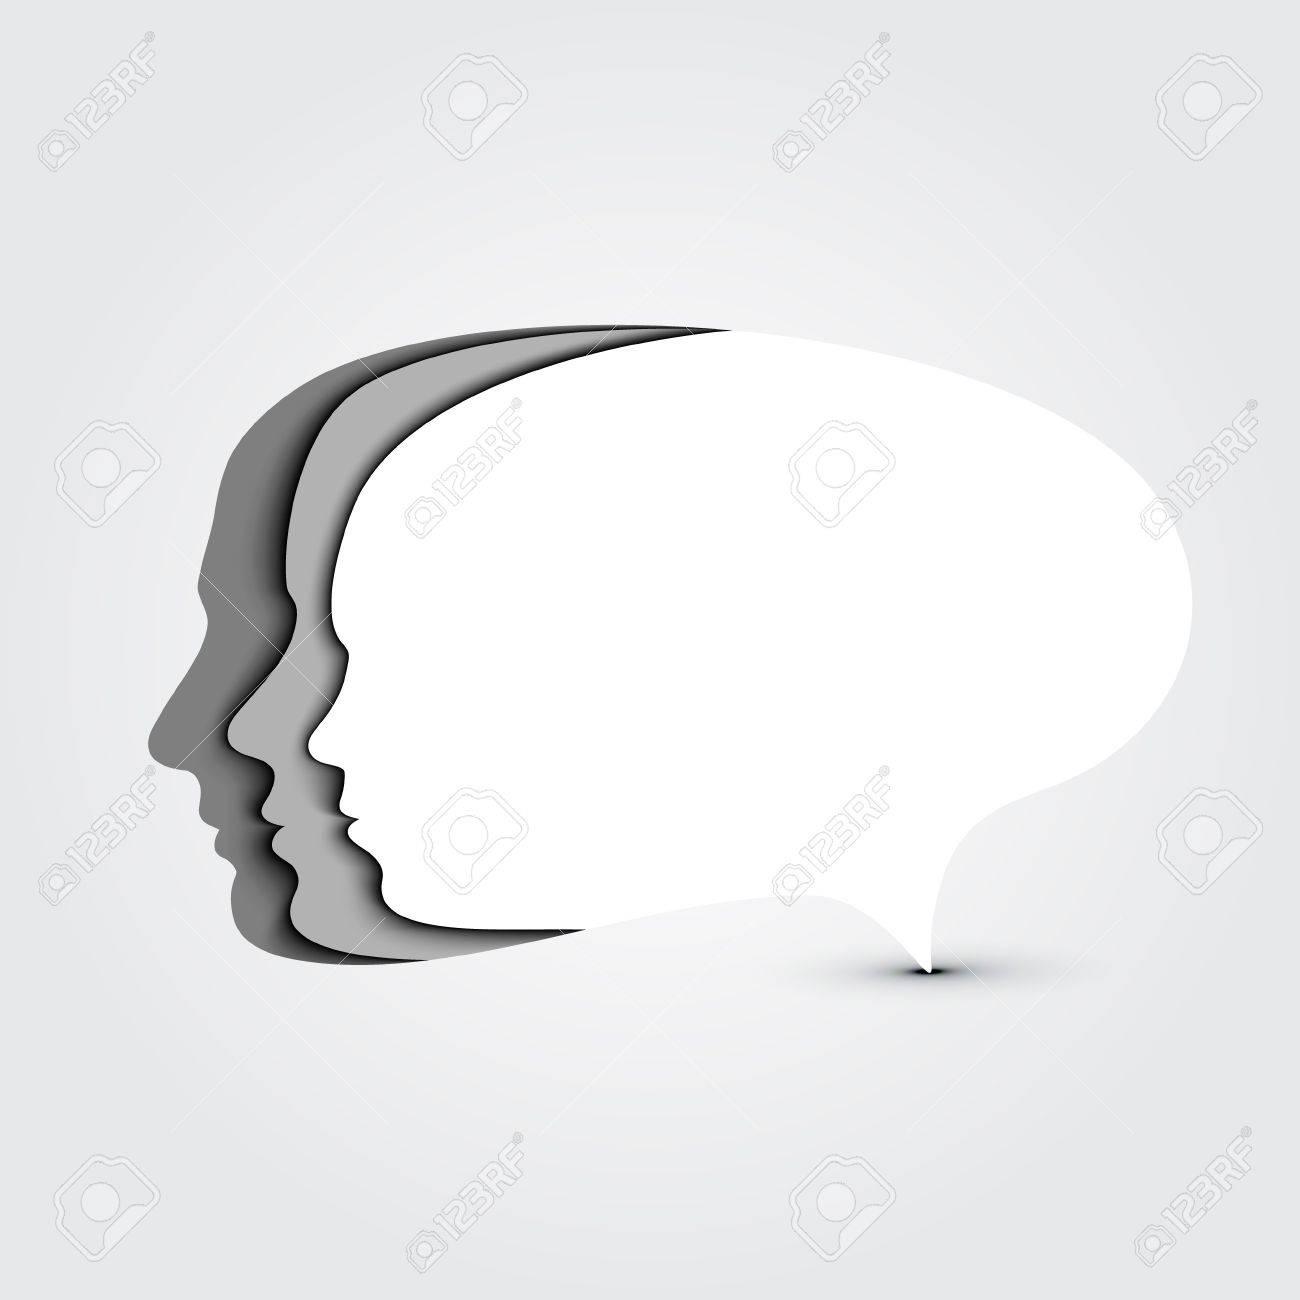 Concept speech bubble  Man, woman and child faces profiles Stock Vector - 16942600